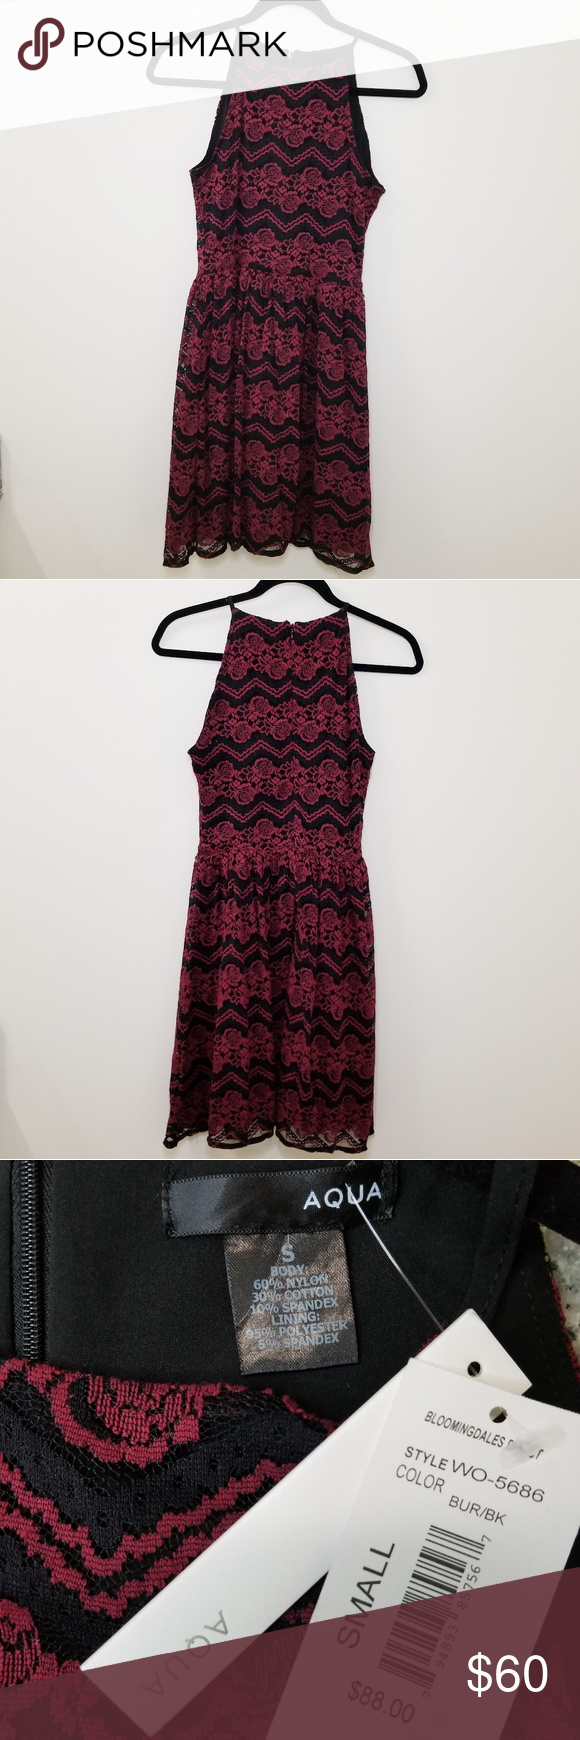 16+ Aqua black lace sleeveless dress ideas